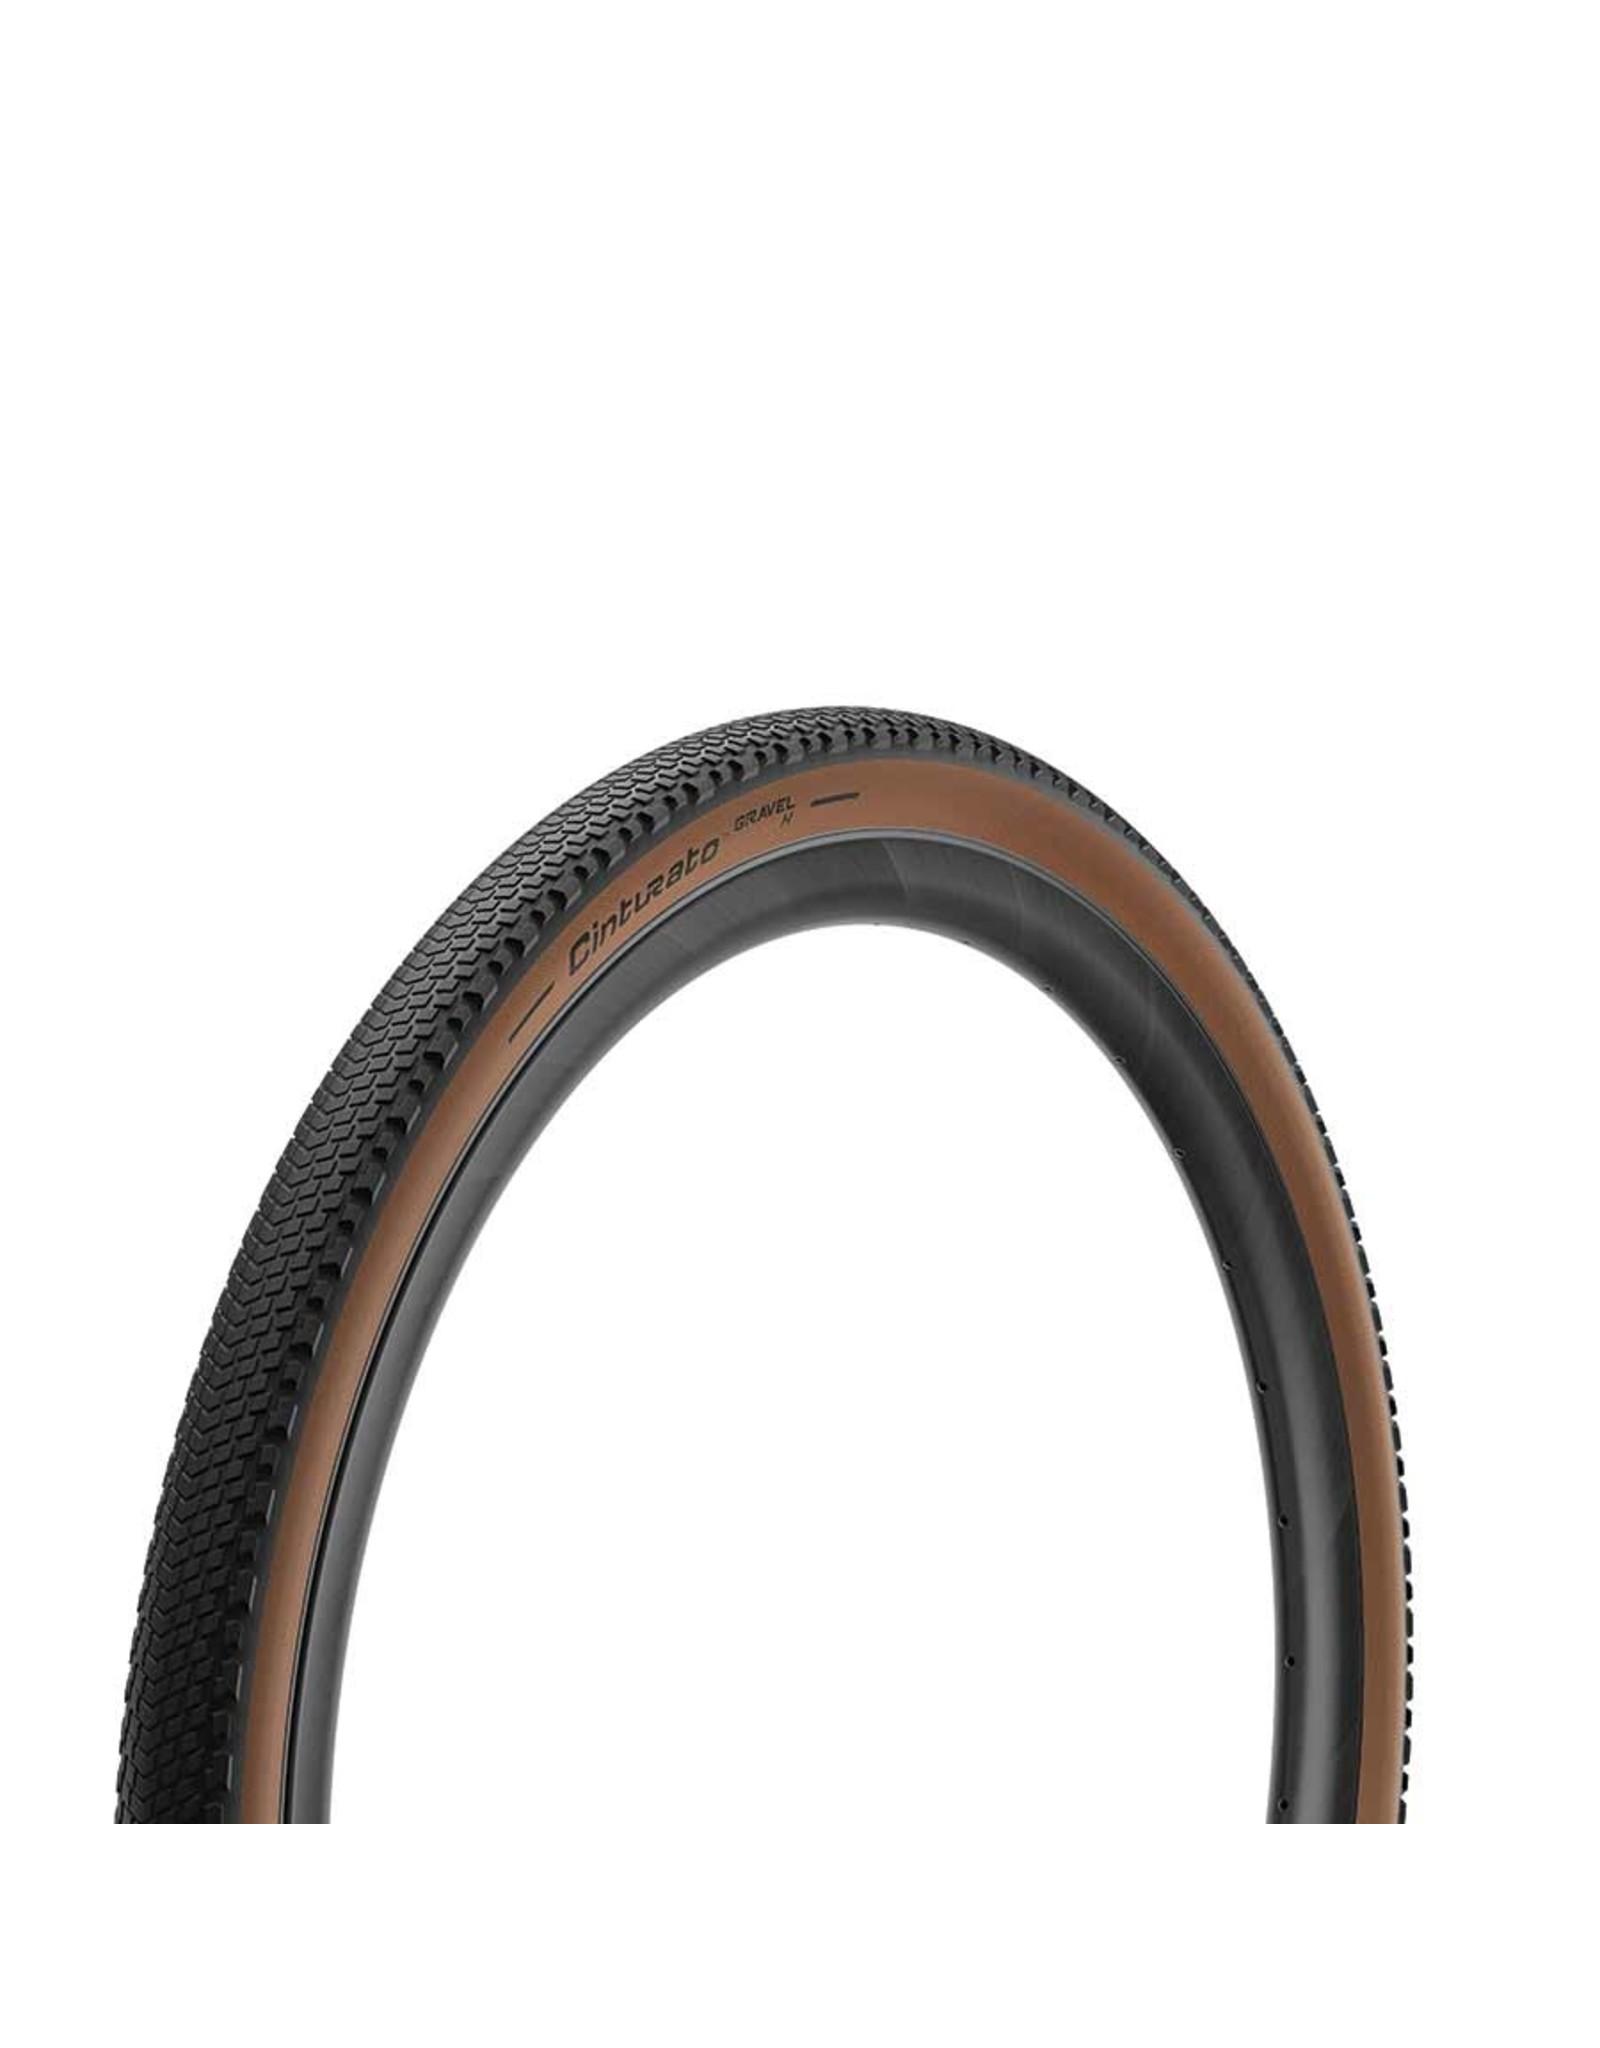 Pirelli, Cinturato Gravel H, Tire, 700x35C, Folding, Tubeless Ready, SpeedGrip, 127TPI, Beige